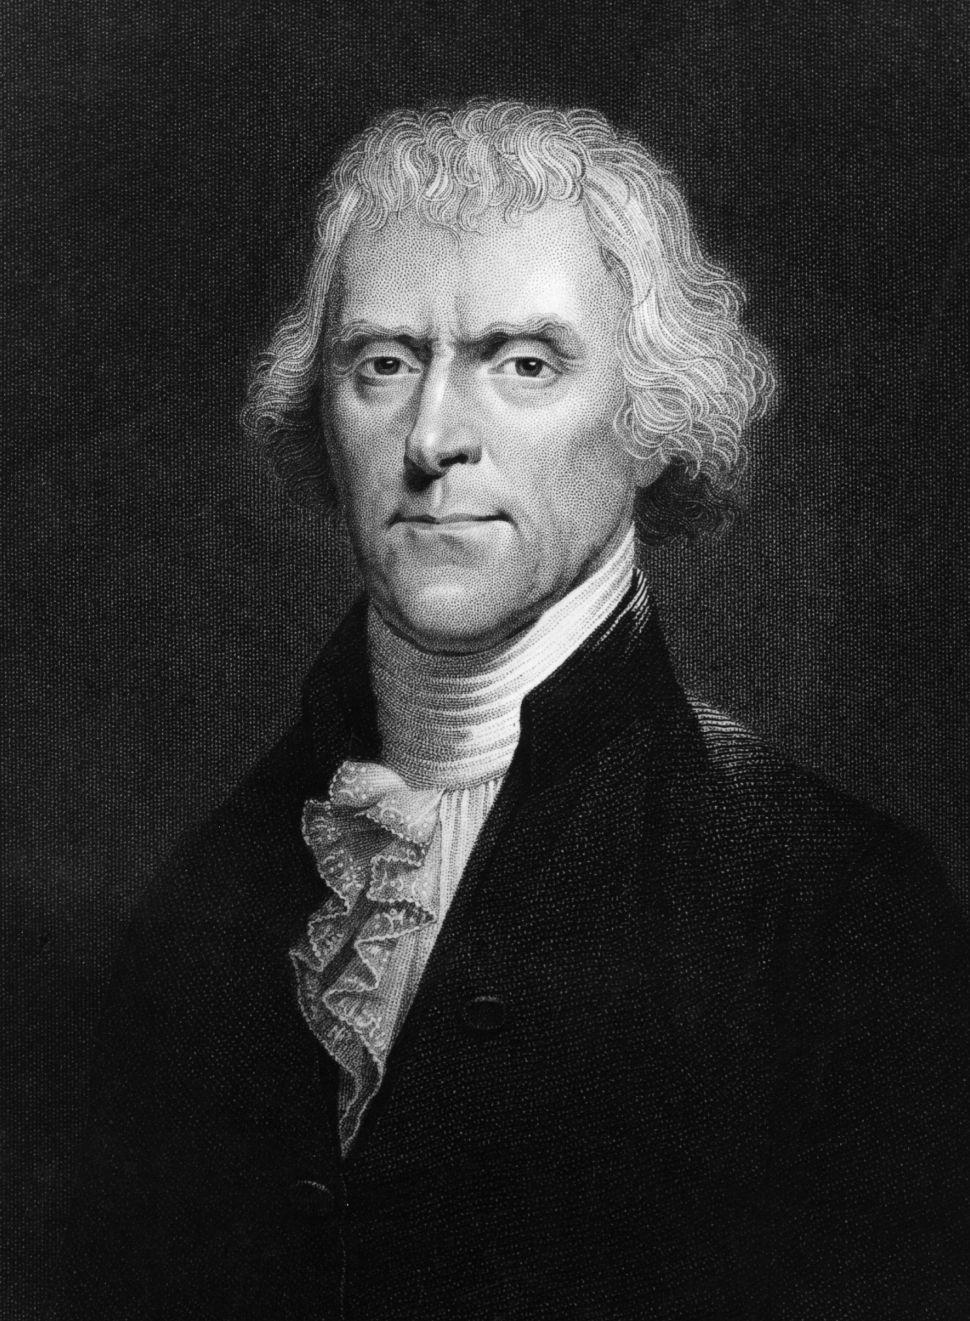 Thomas Jefferson's Record on Slavery Wasn't All Bad